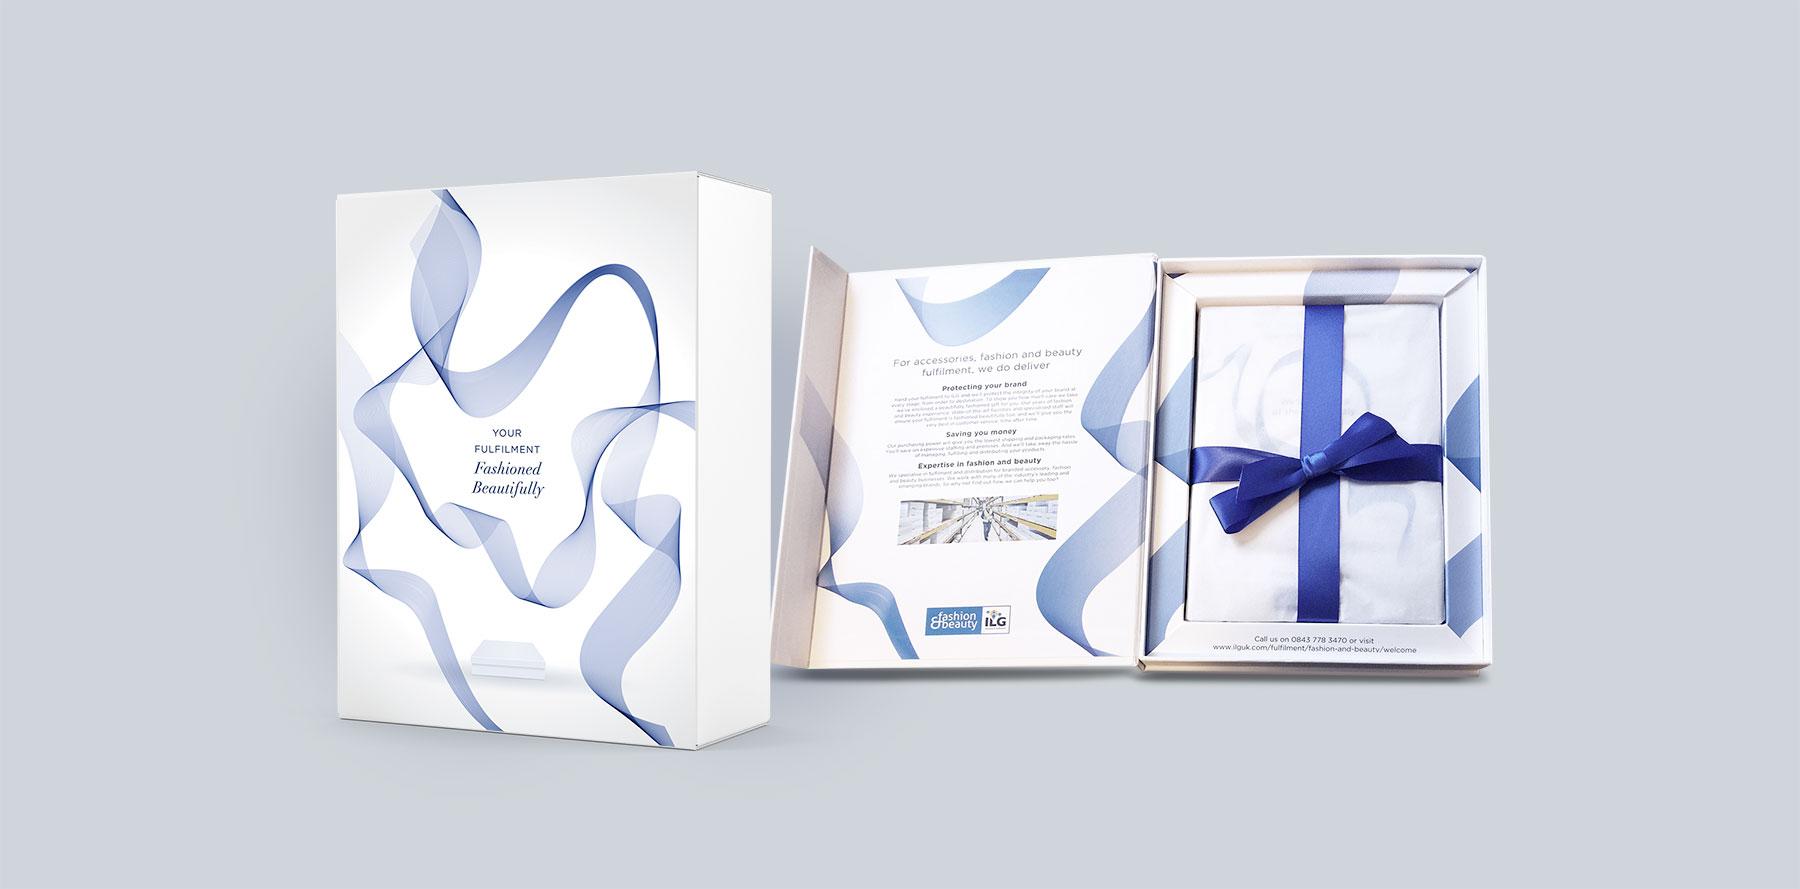 ILG Fashion and Beauty direct mail 1